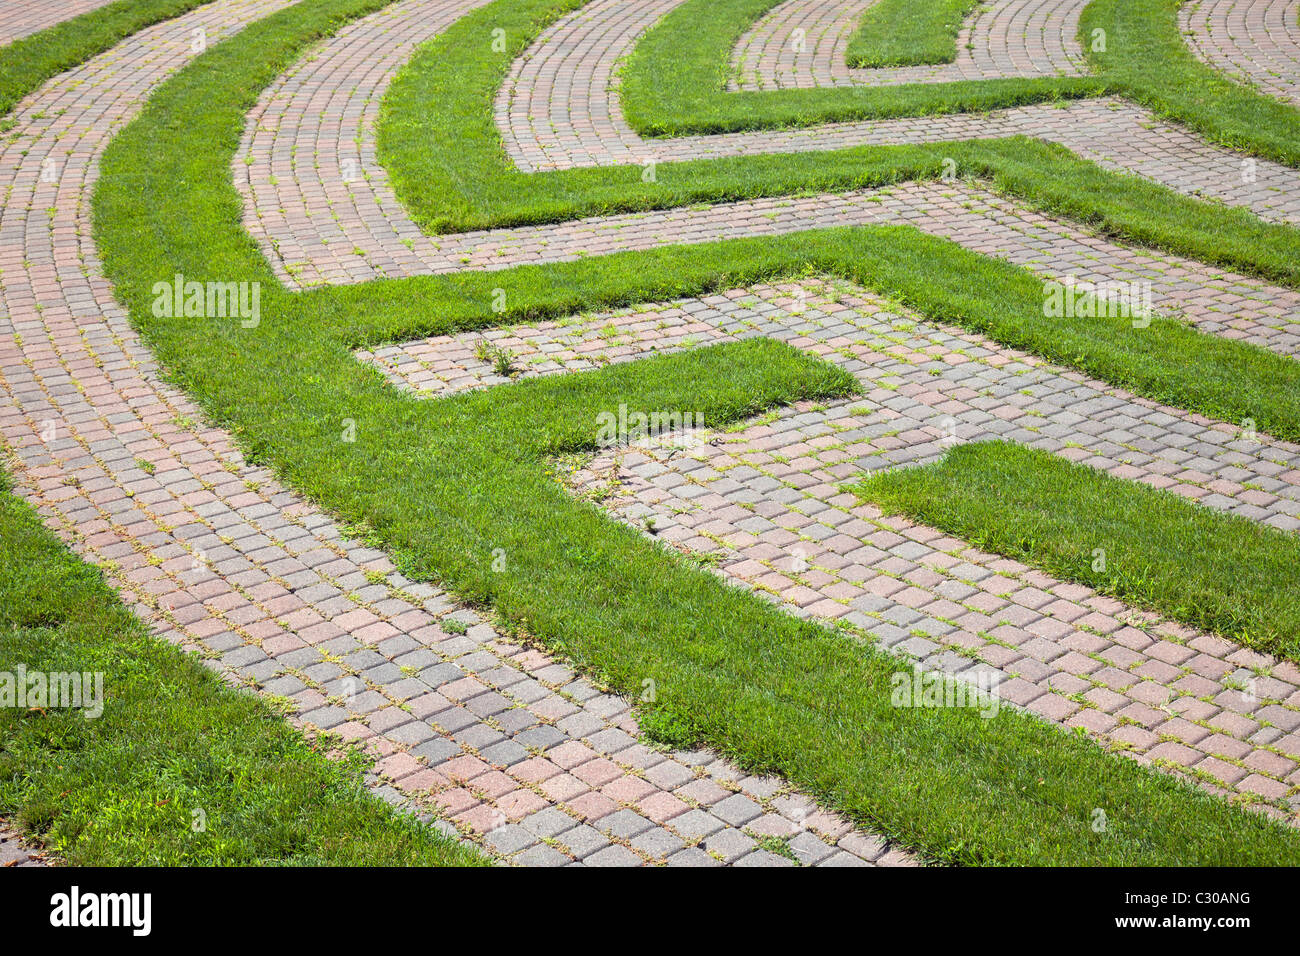 Park maze with a cobblestone walkway and grass boundaries. Horizontal shot. - Stock Image